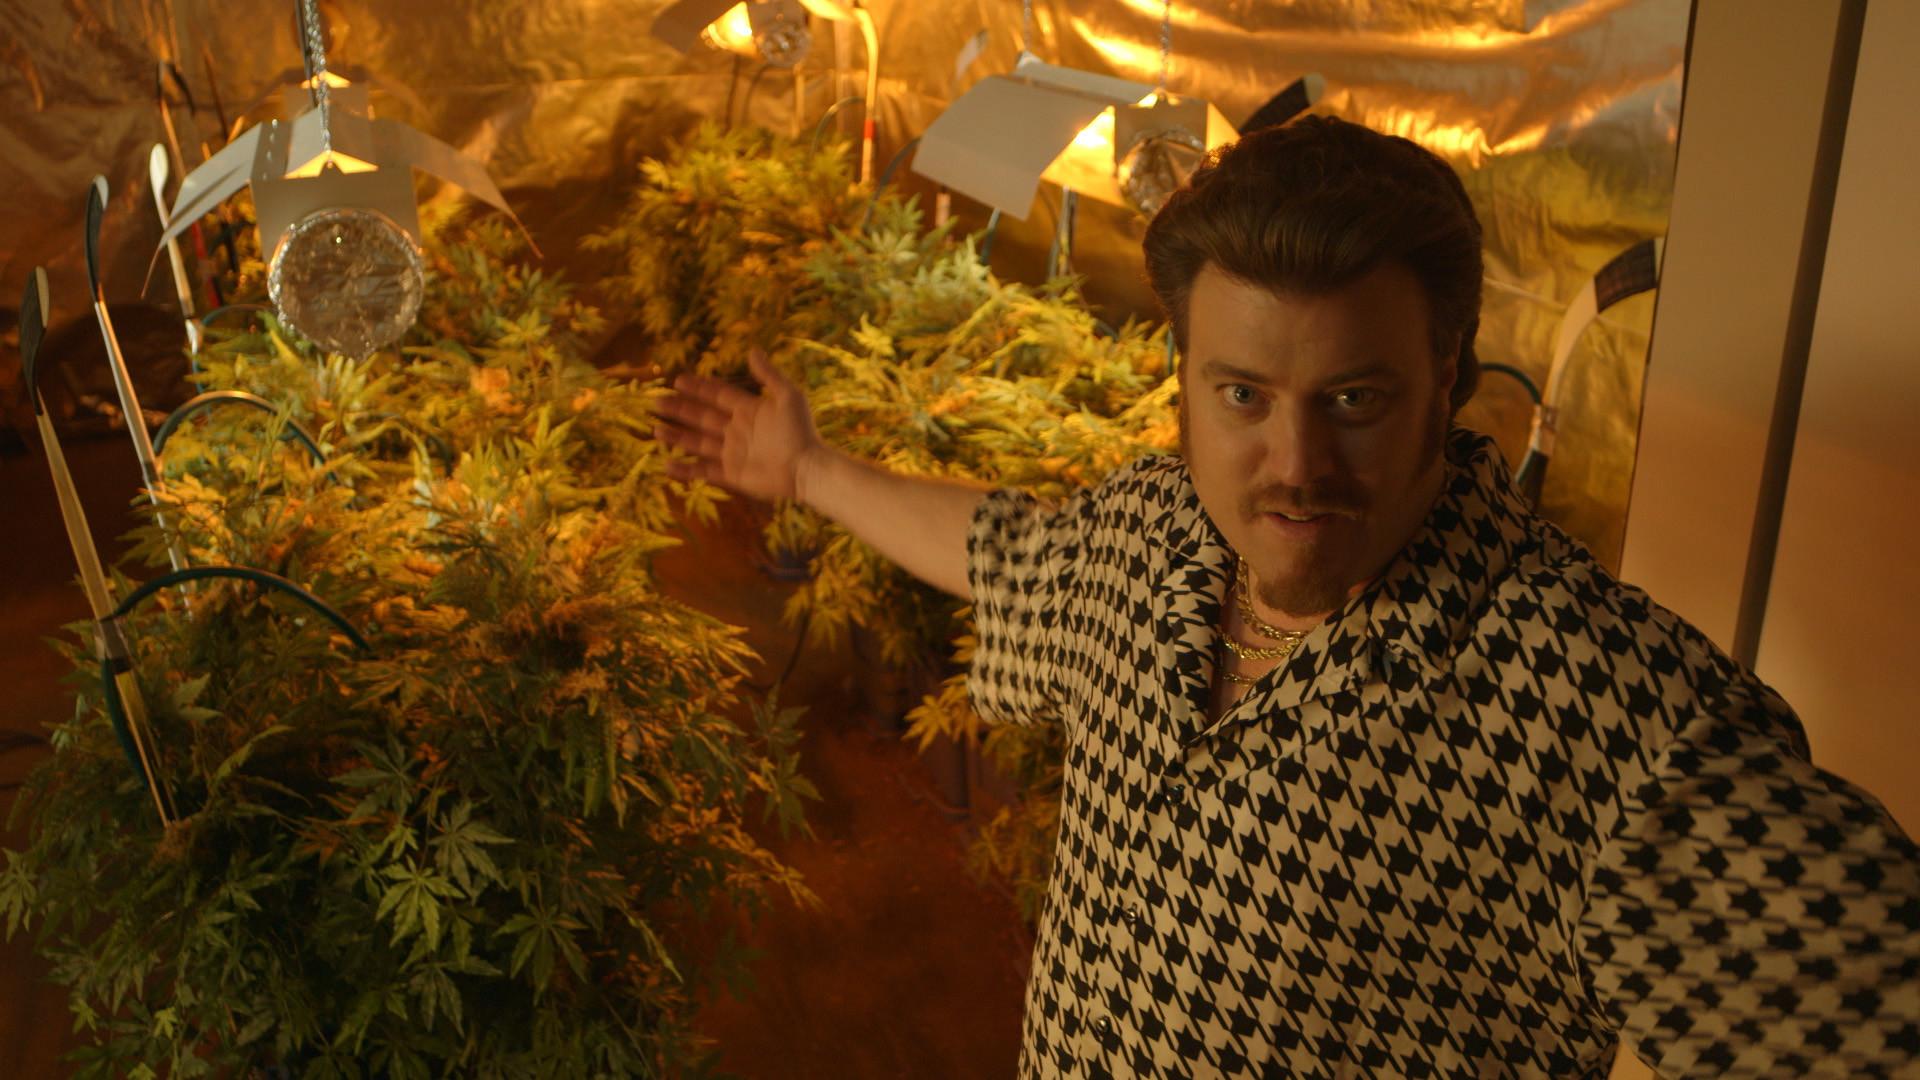 Ricky (1)_7jnkghdu.jpg